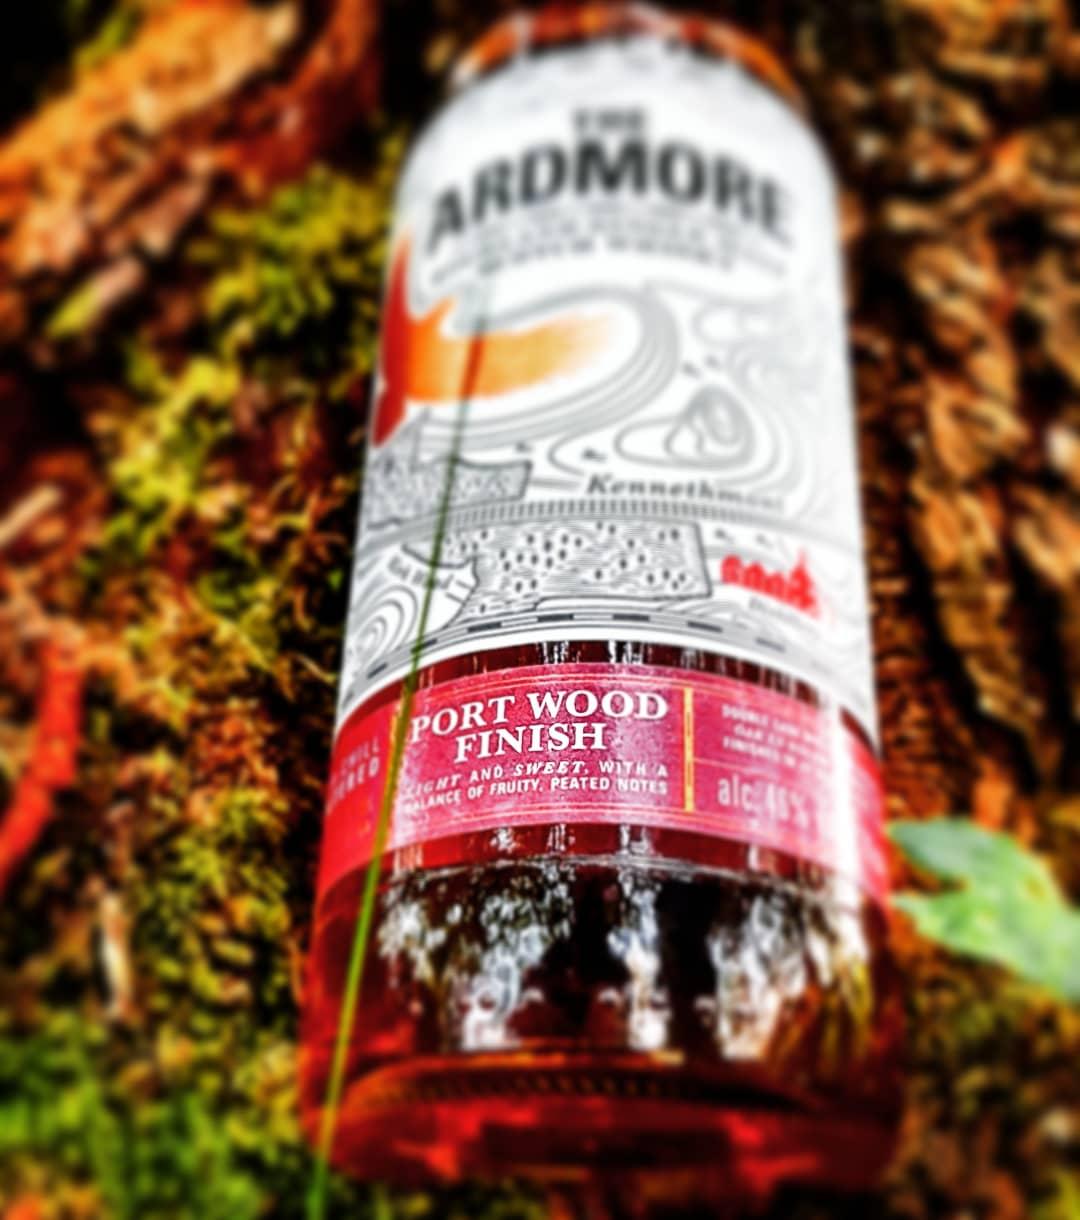 The Ardmore 12 Jahre Highland Single Malt Scotch Whisky Port Wood Finish